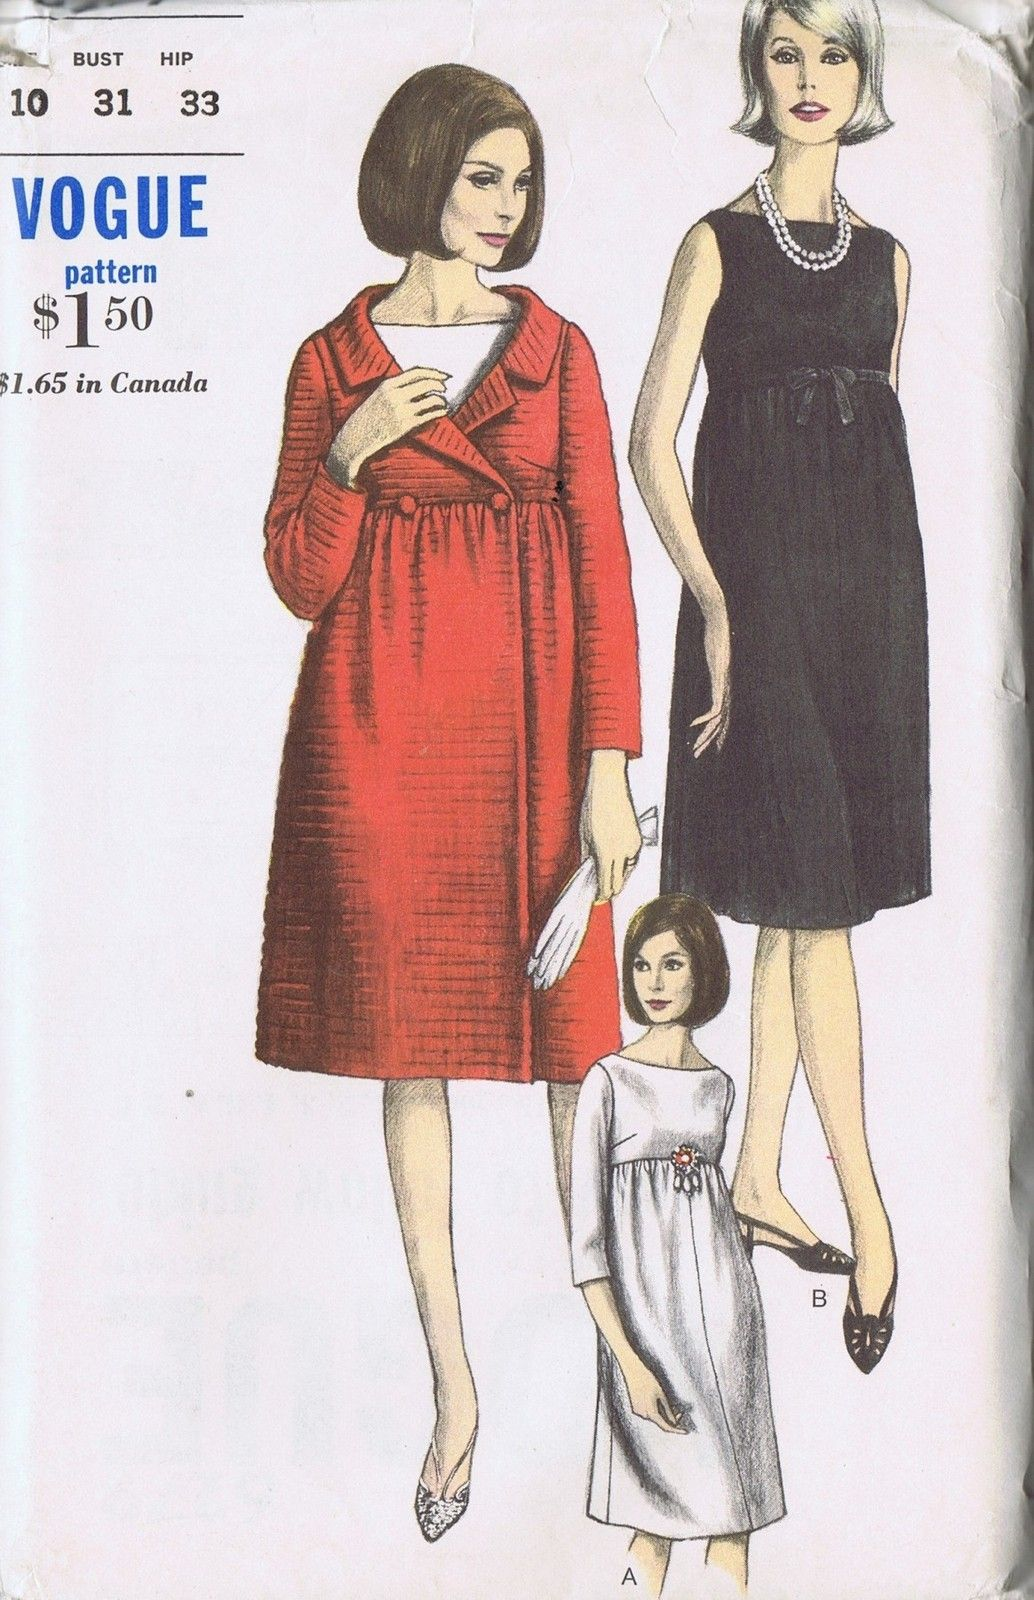 Vintage maternity coat dress 60s sewing pattern vogue 6279 bust 31 vintage maternity coat dress 60s sewing pattern vogue 6279 bust 31 hip 33 uncut ombrellifo Gallery